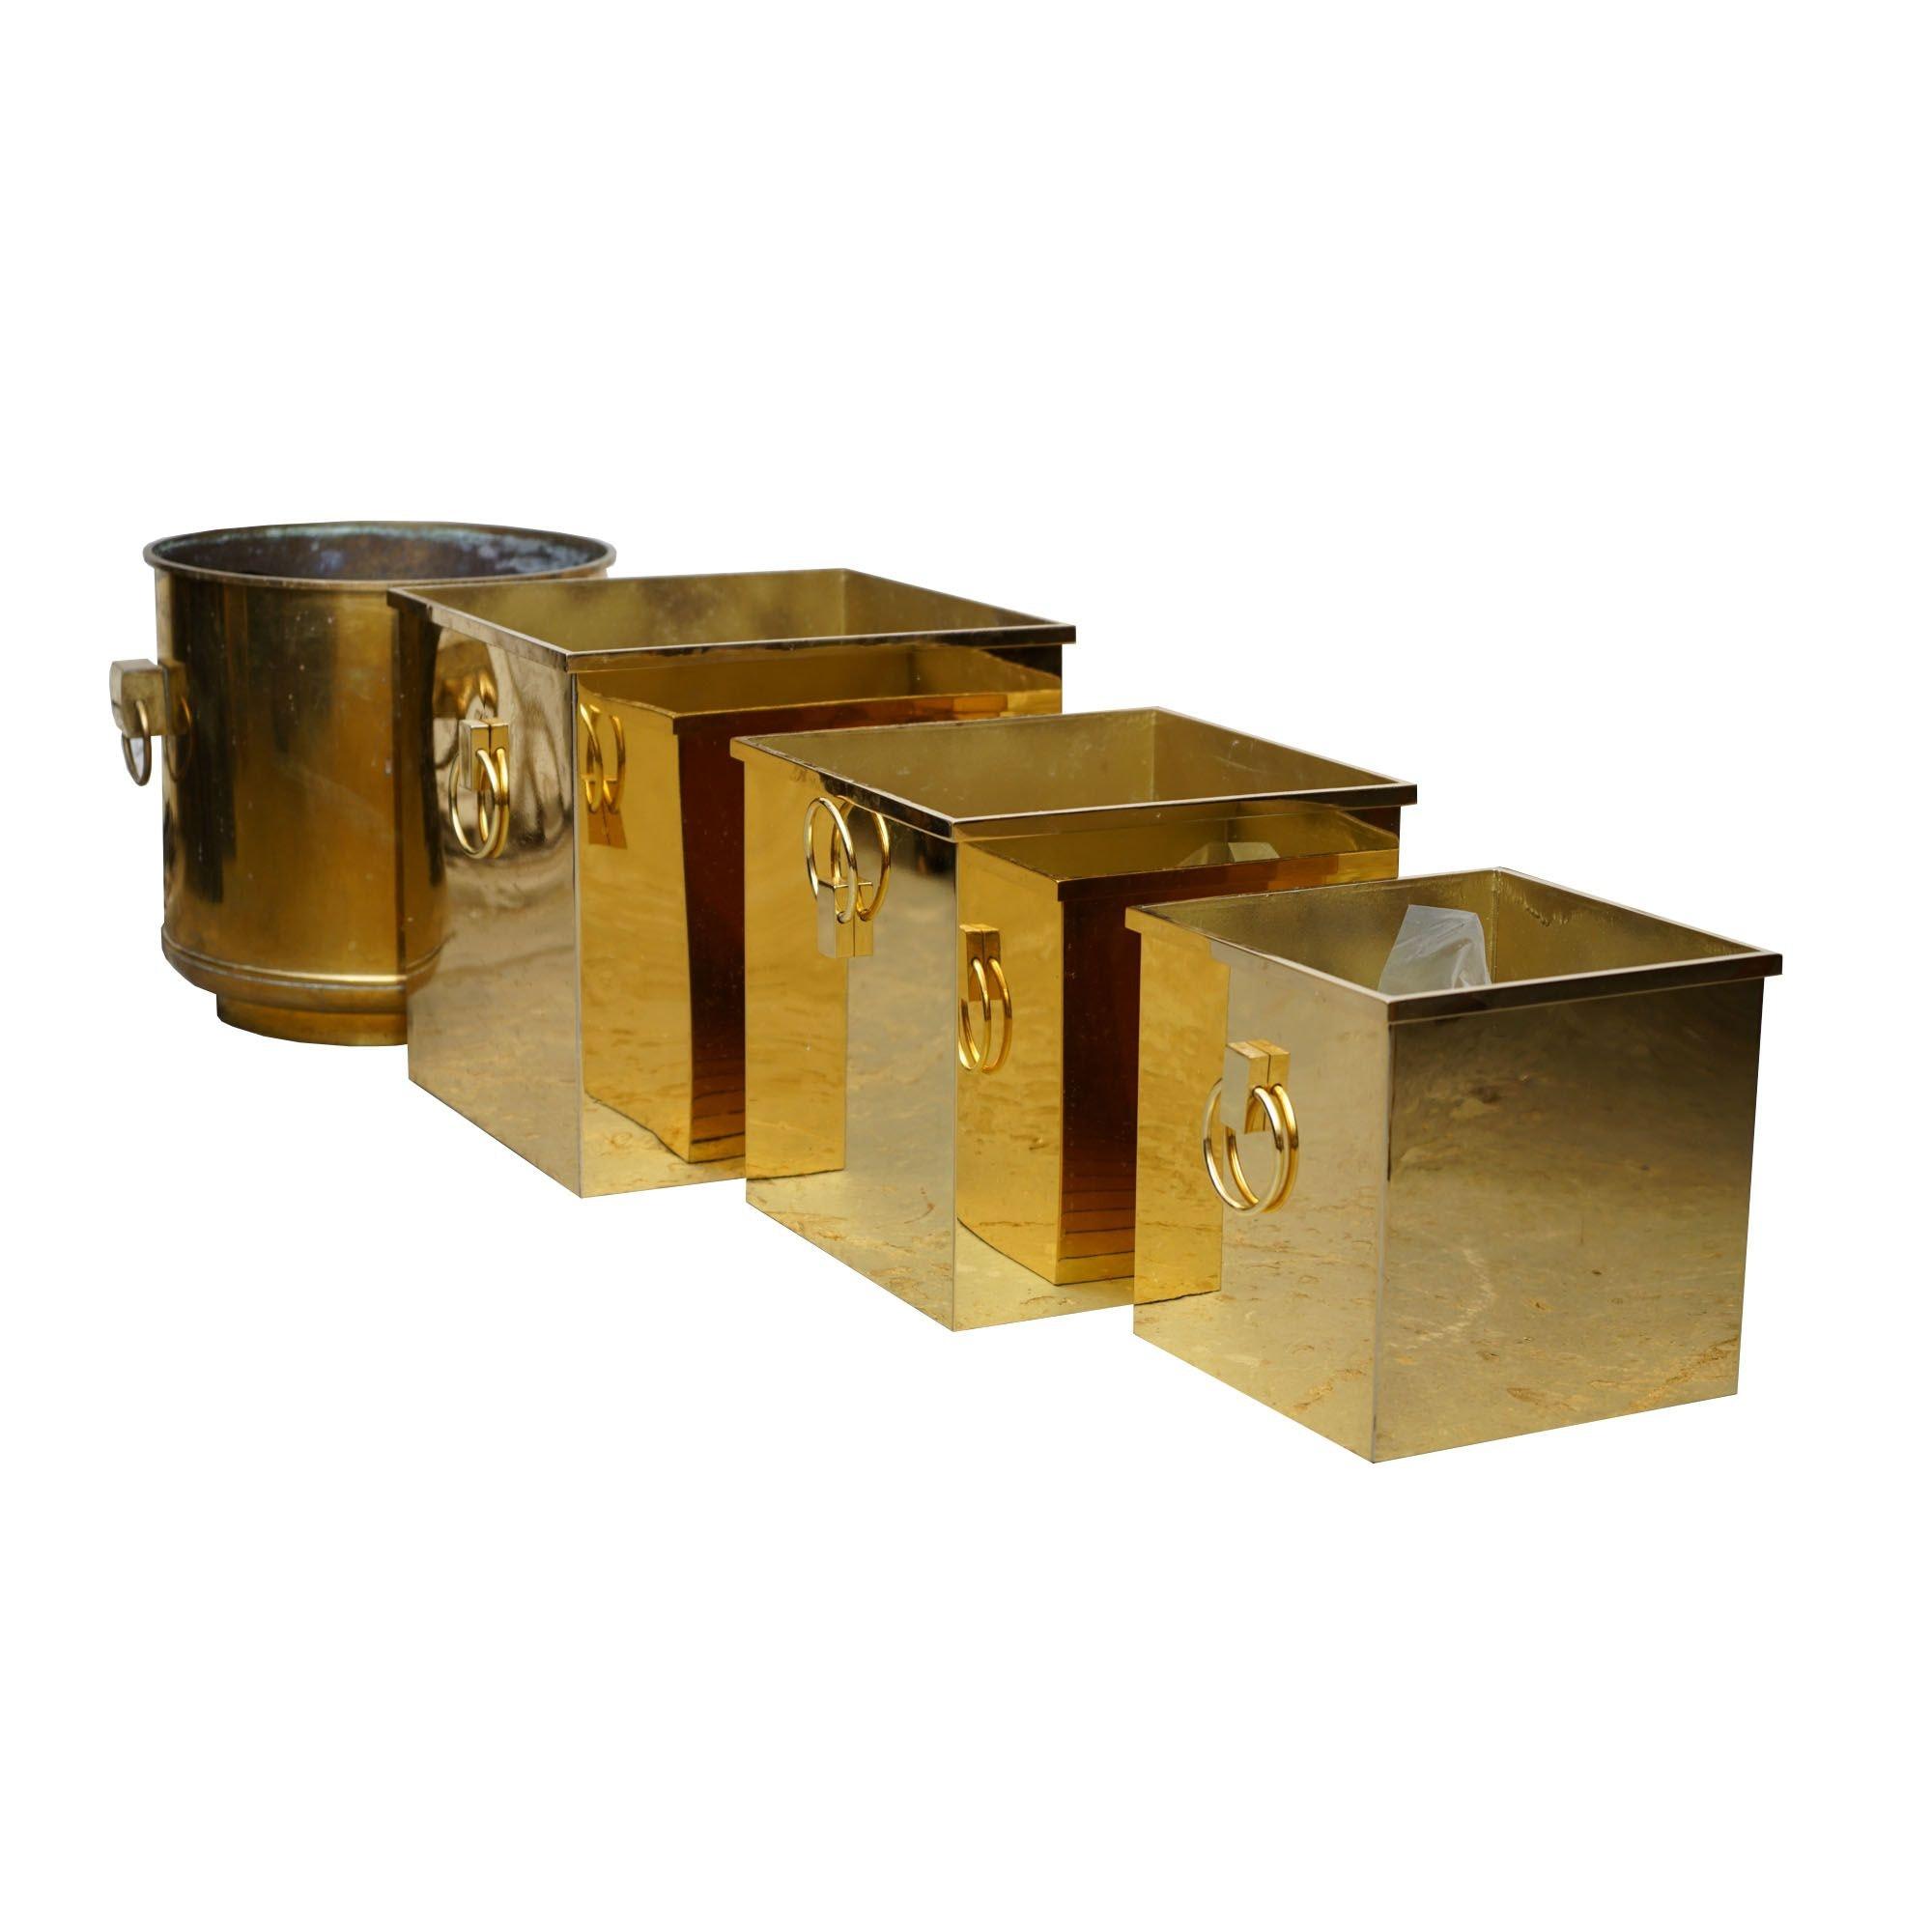 Brass Three-Piece Nesting Planter Set with Other Brass Planter